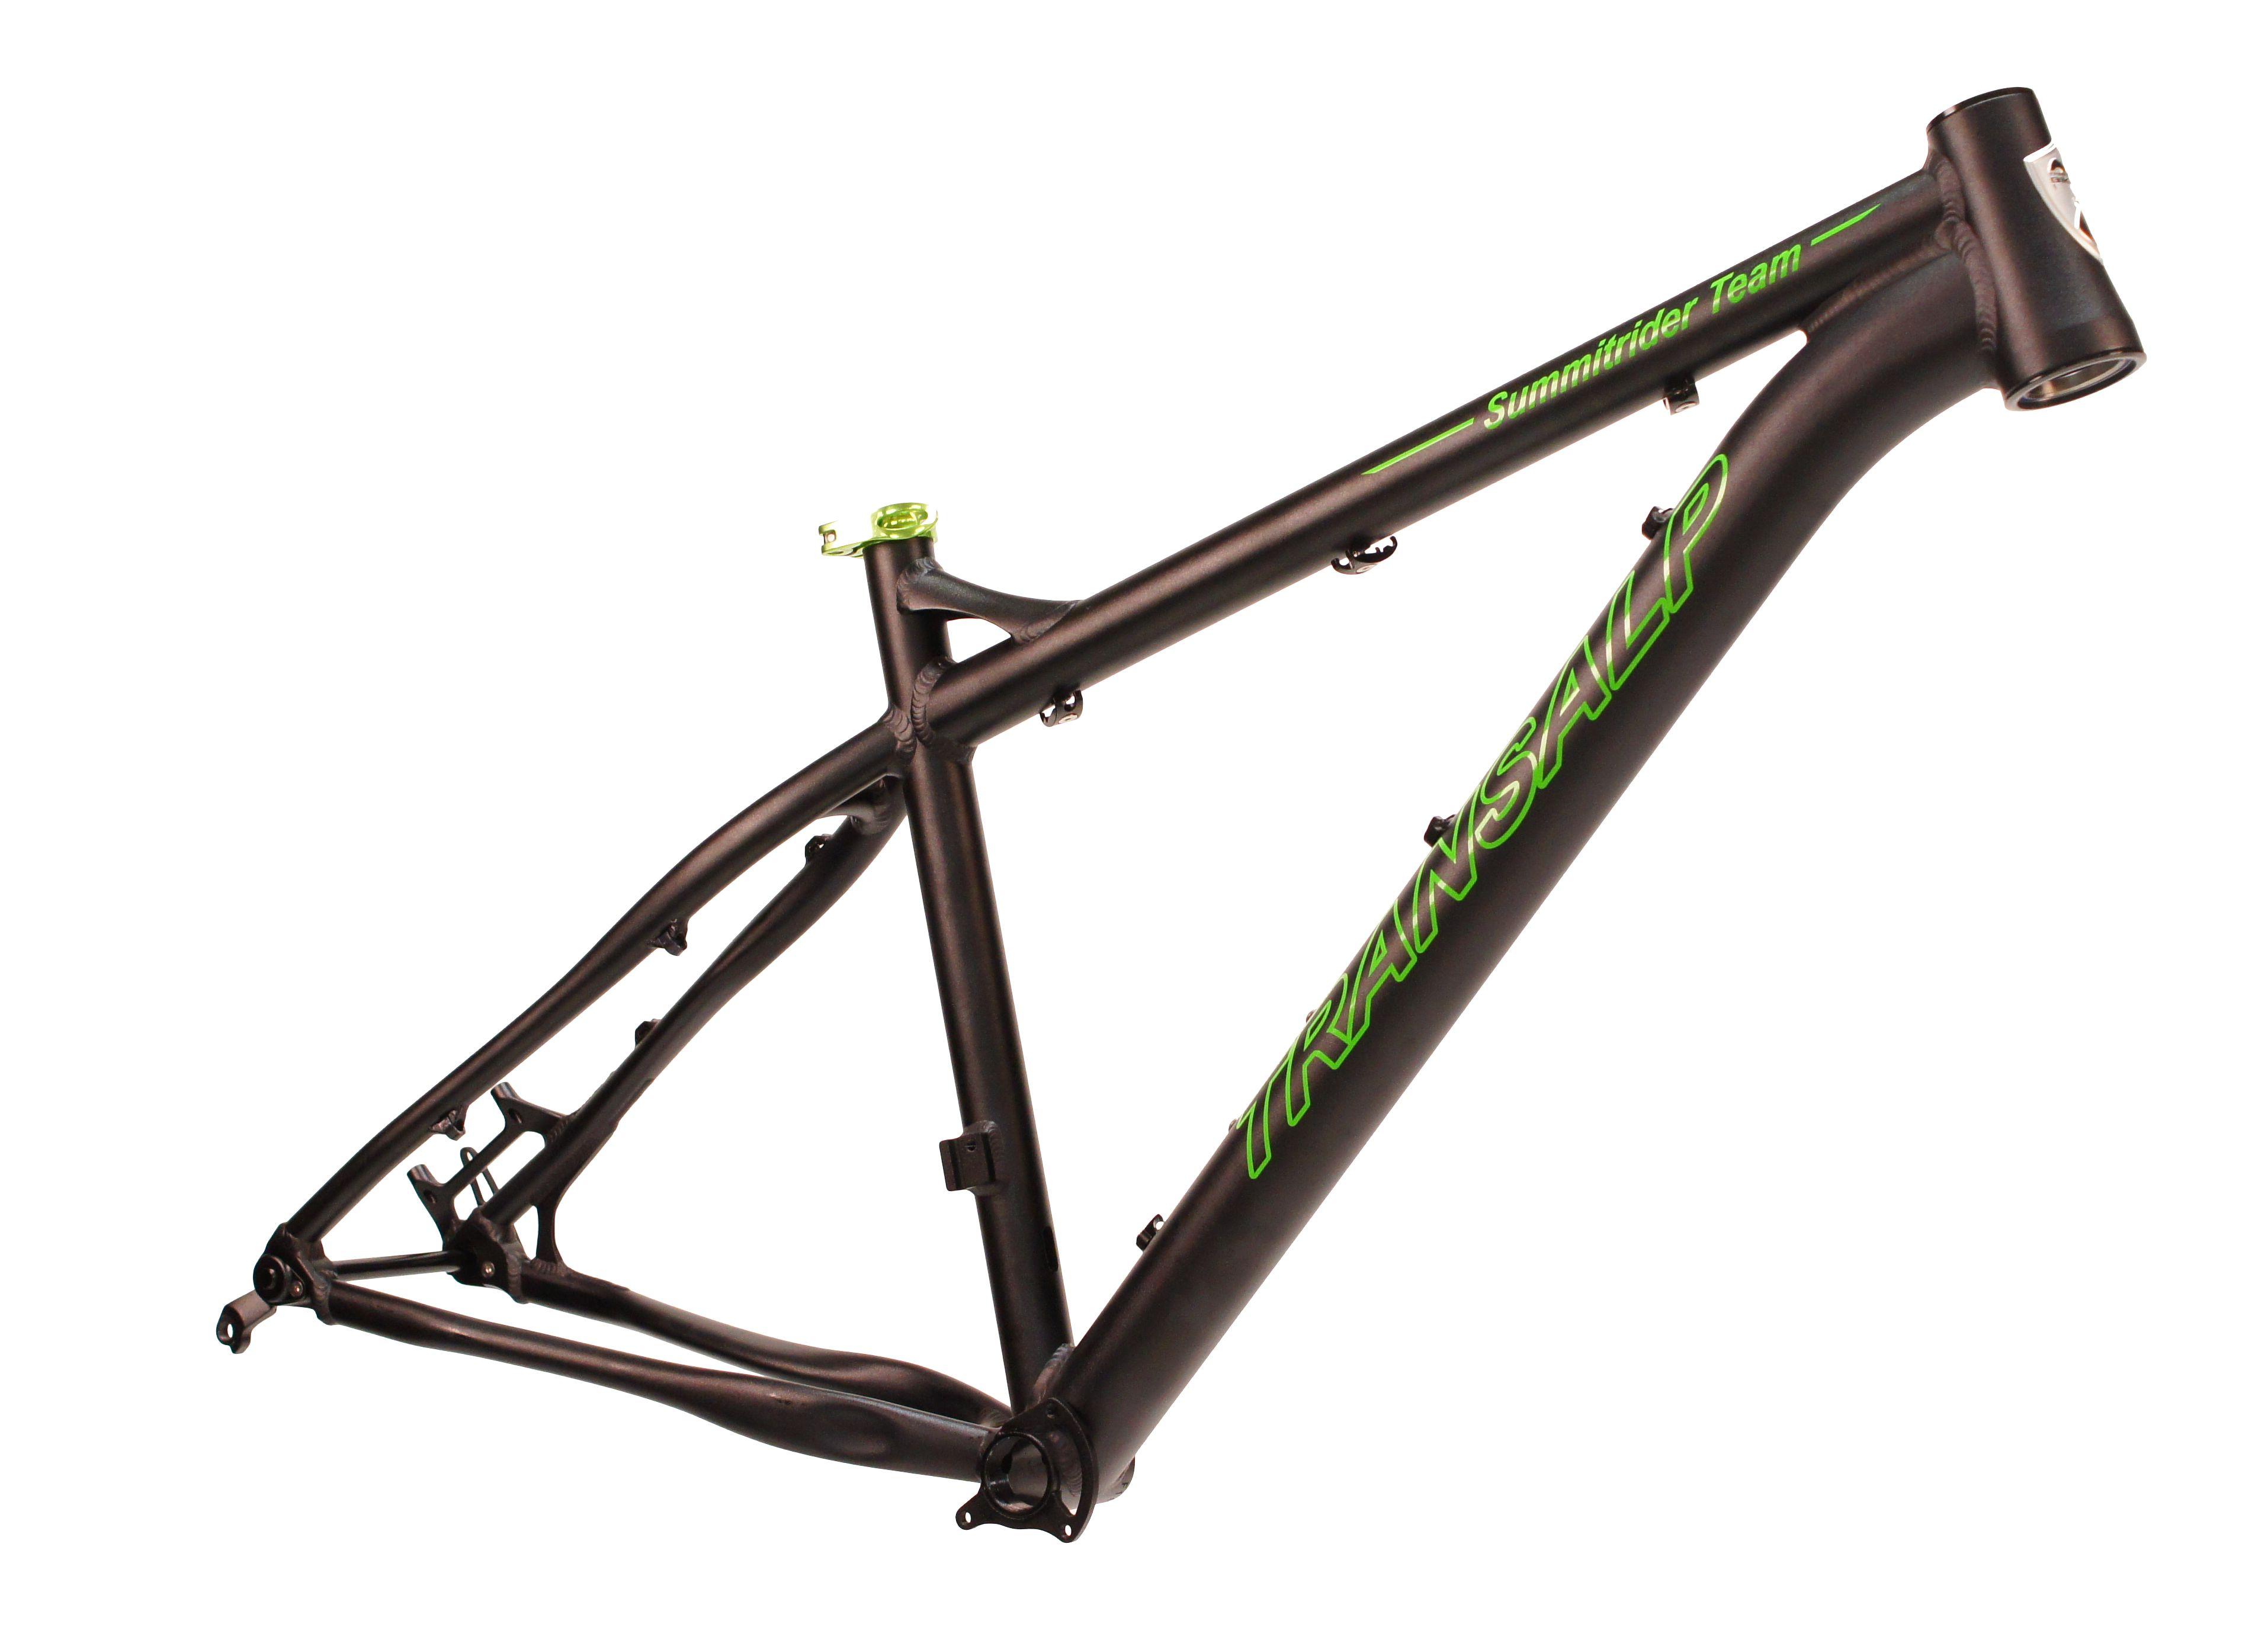 mtb rahmen hardtail und fully mountainbike rahmen 26 27 5 29 zoll transalp bikes. Black Bedroom Furniture Sets. Home Design Ideas